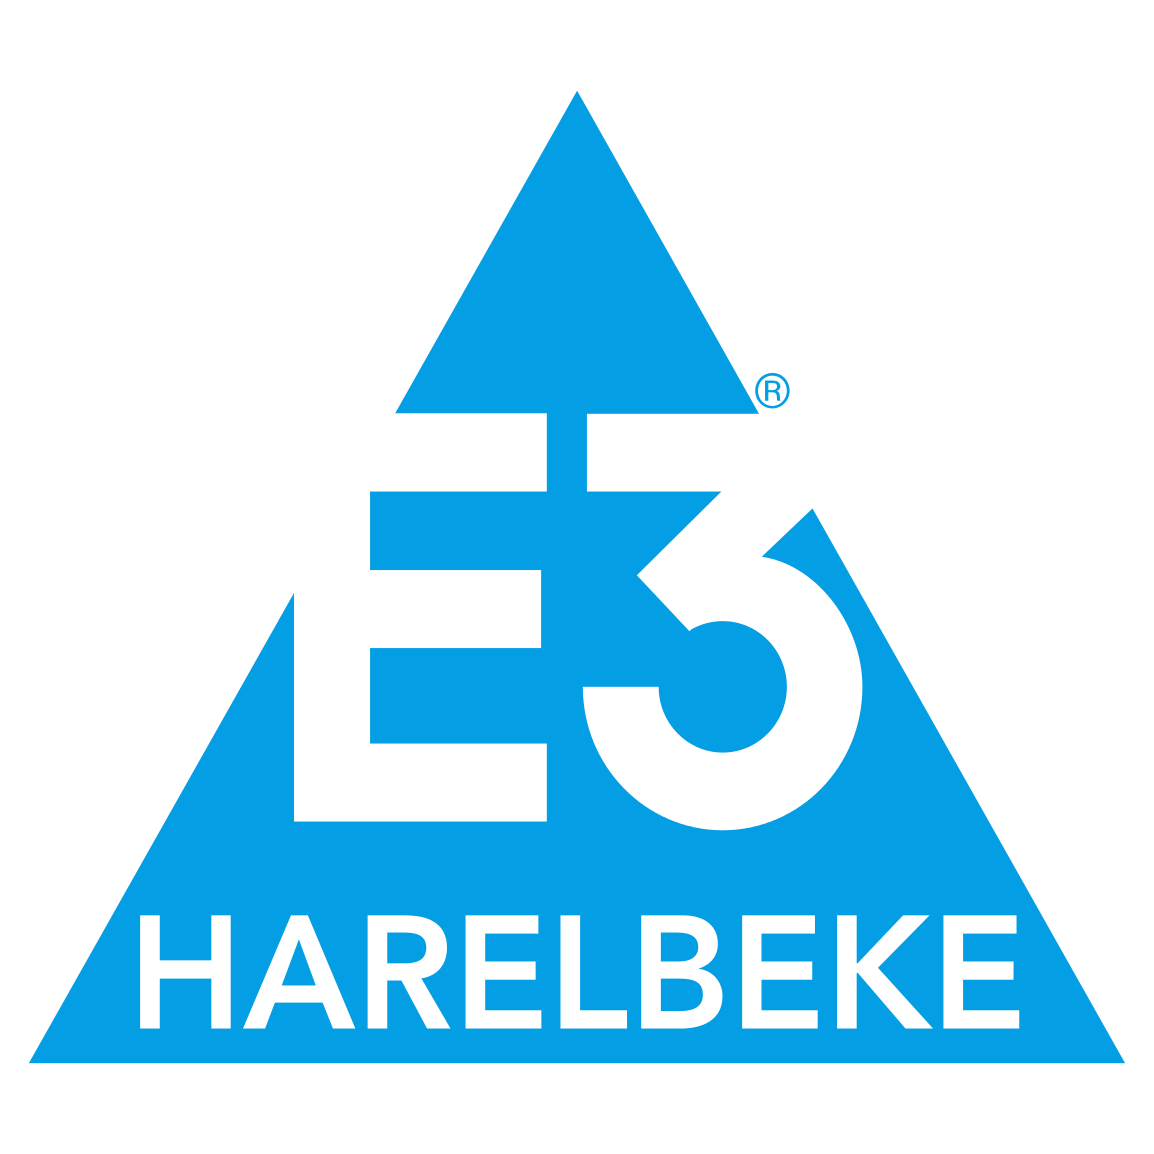 2017 UCI Cycling World Tour - E3 Harelbeke